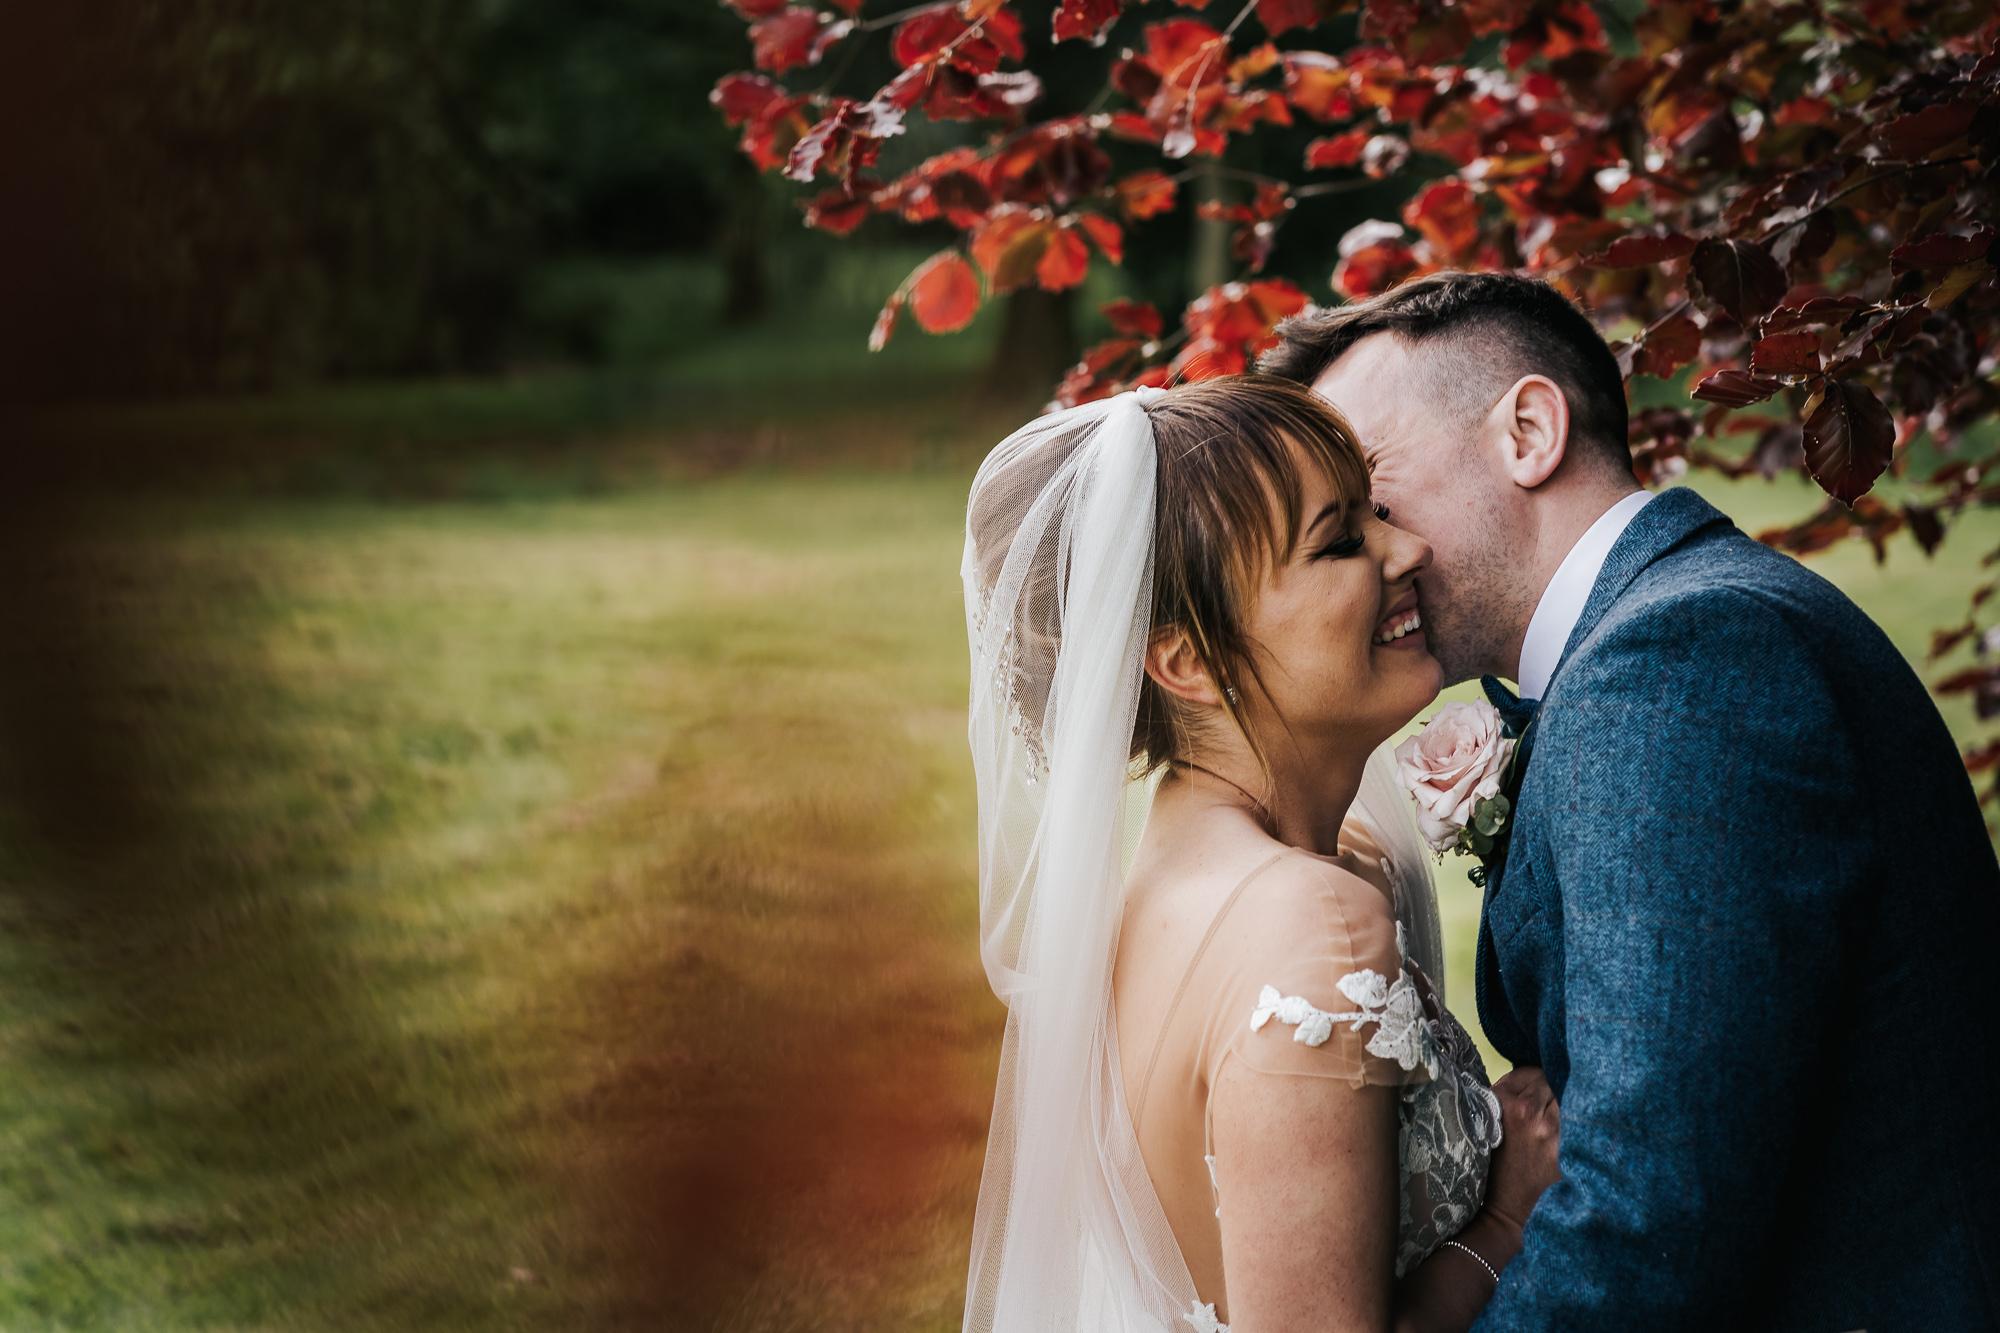 Rivington Hall Barn Wedding PHotographer lancashire wedding photography (24 of 34).jpg